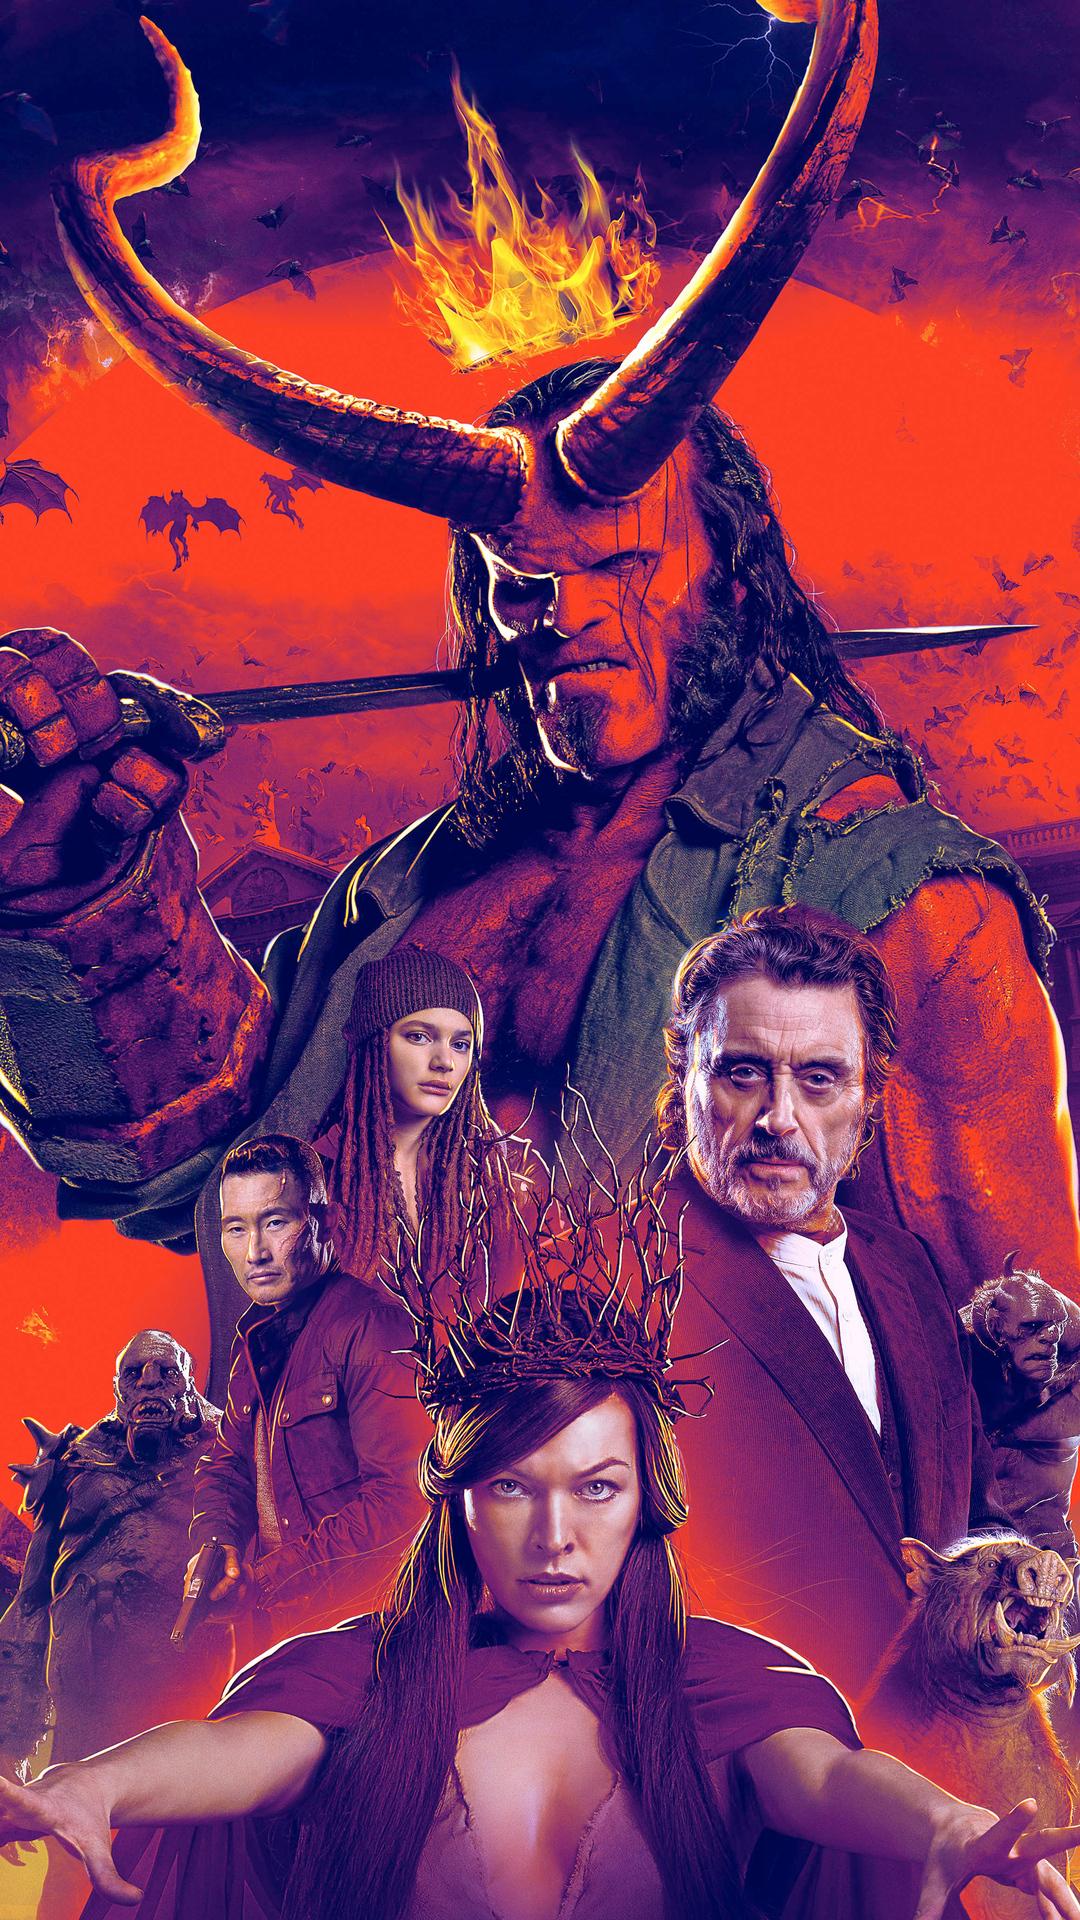 1080x1920 Hellboy Movie Poster 2019 Iphone 7,6s,6 Plus, Pixel xl ,One Plus 3,3t,5 HD 4k ...